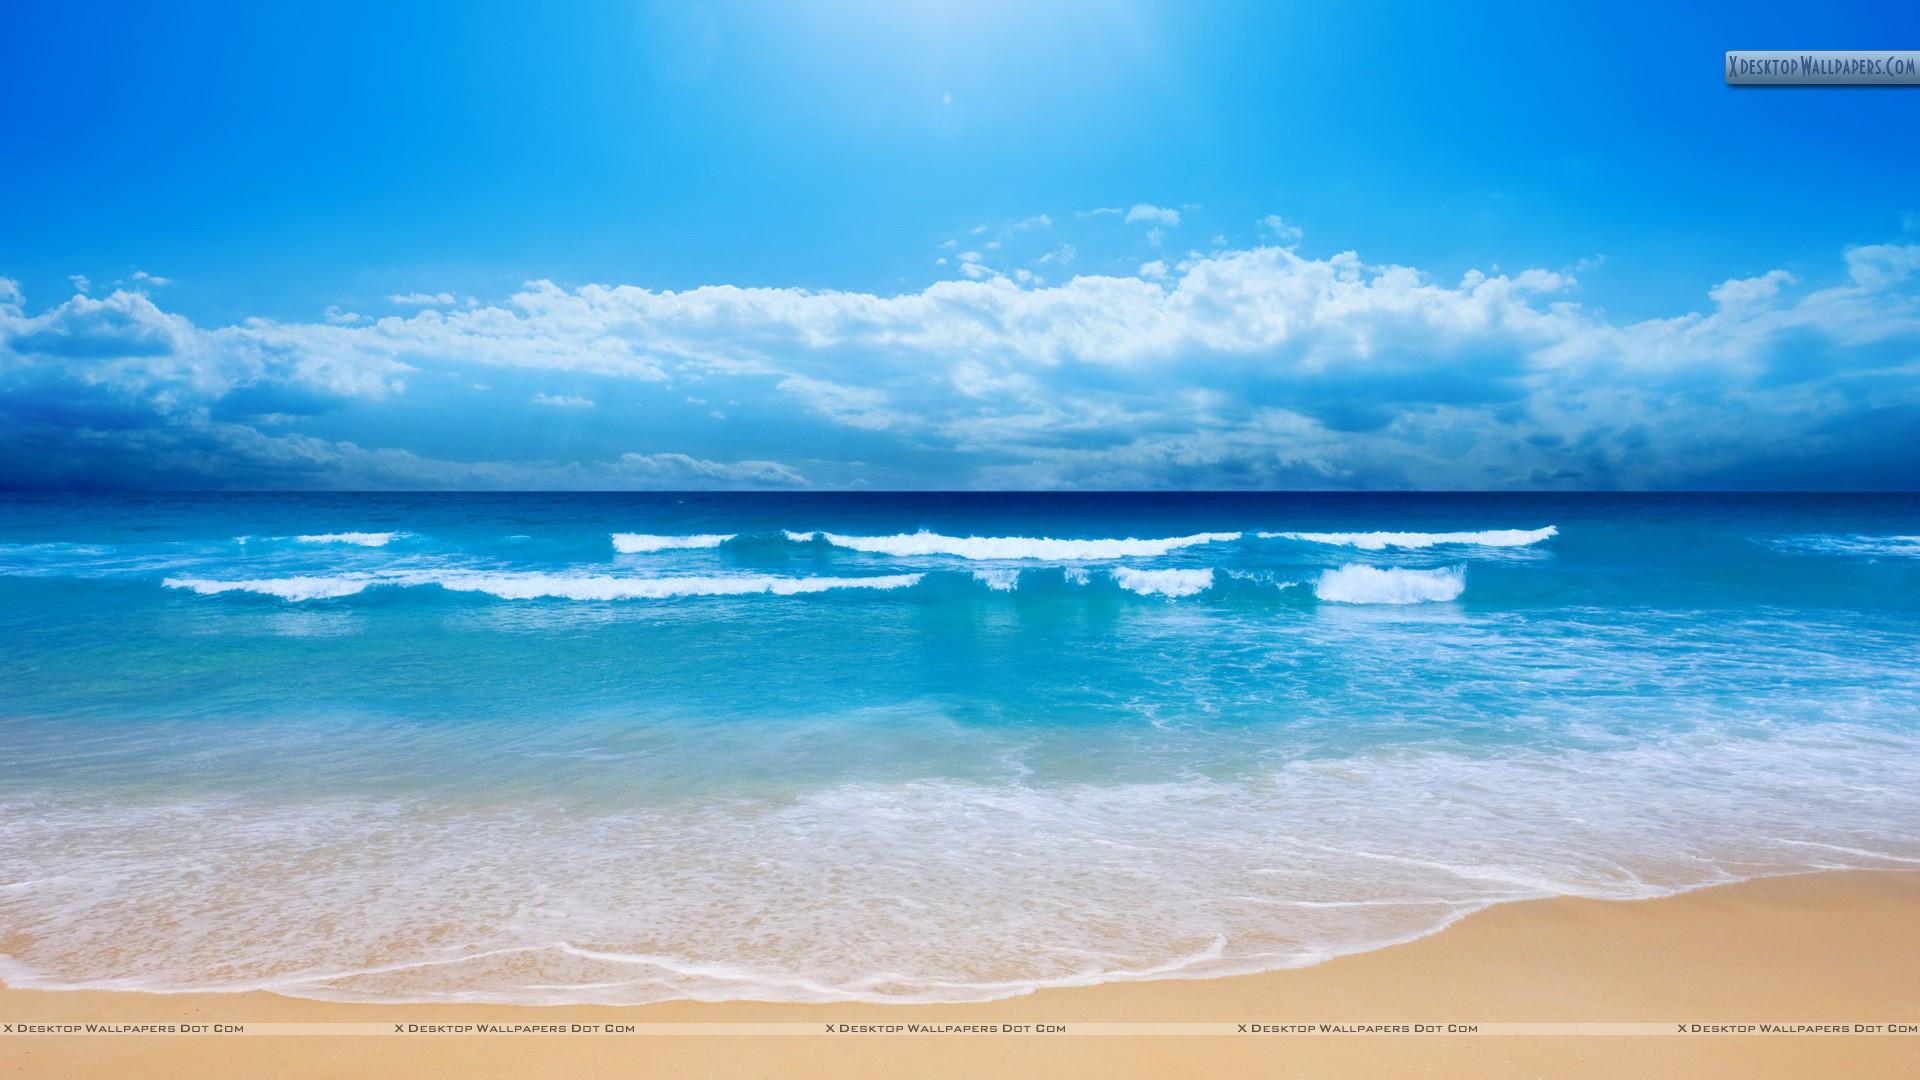 Cool Blue Sea Shore Scene And Waves Wallpaper 1920x1080